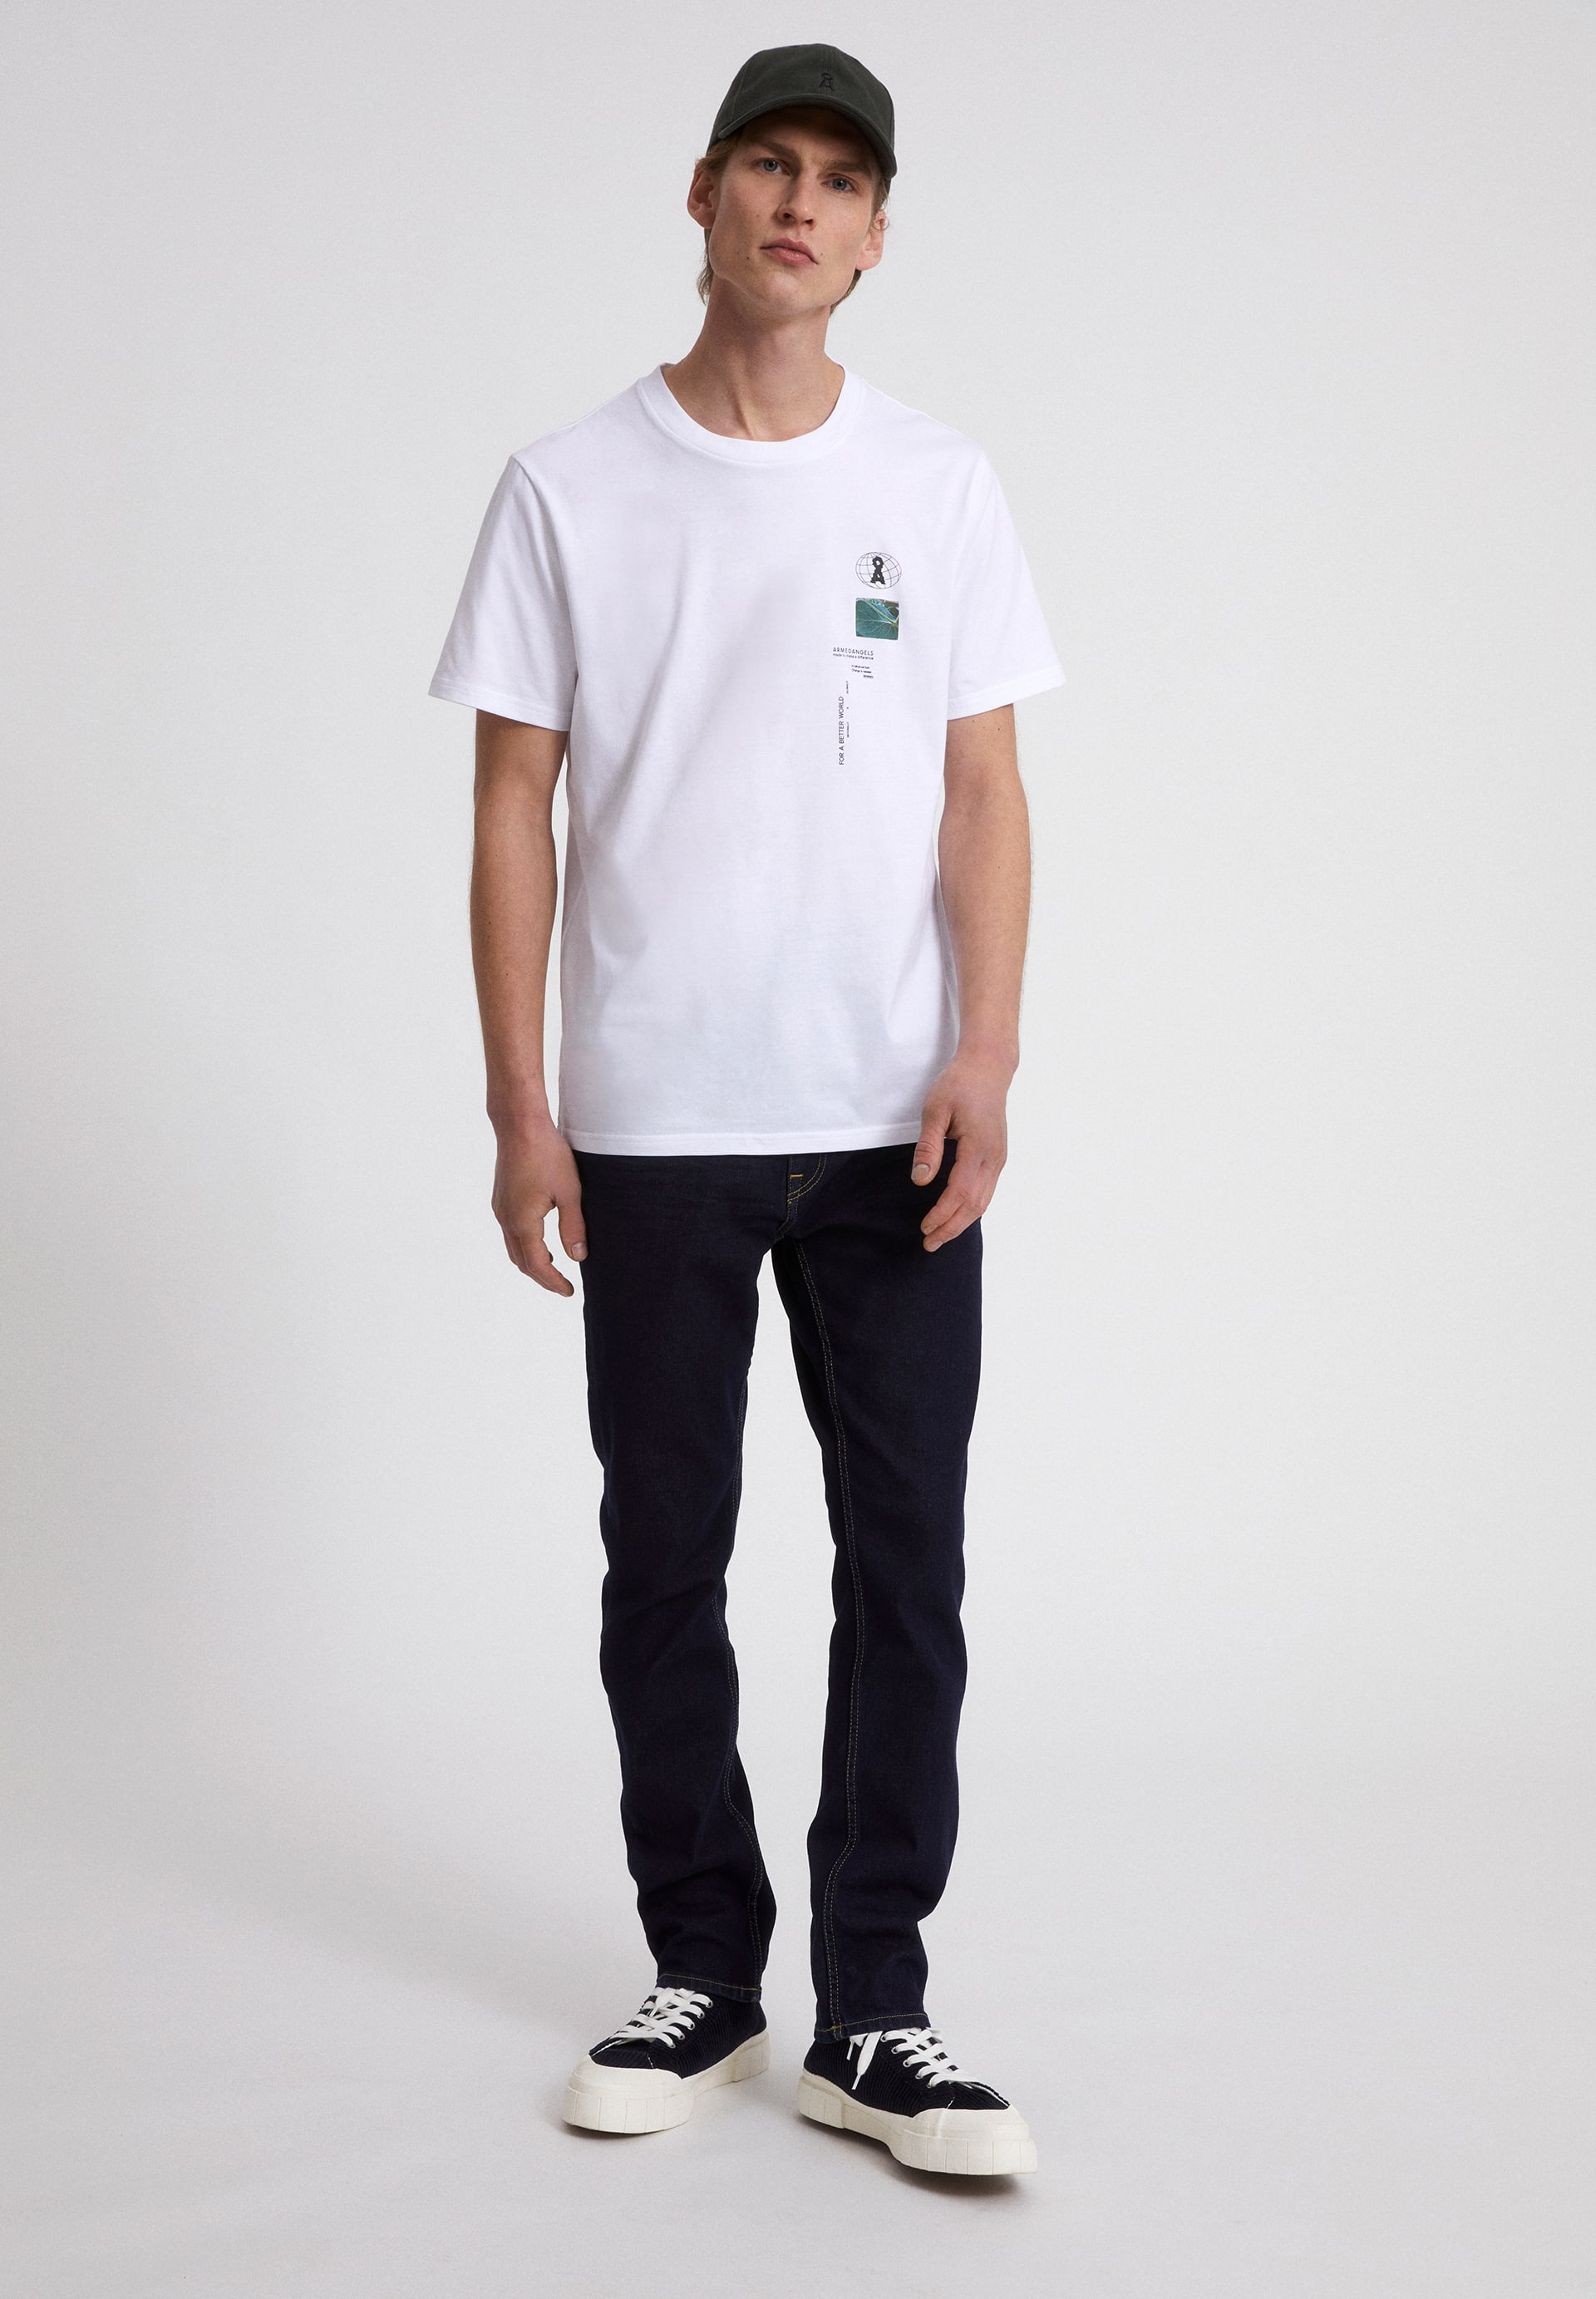 AADO BETTER WORLD T-shirt en coton biologique